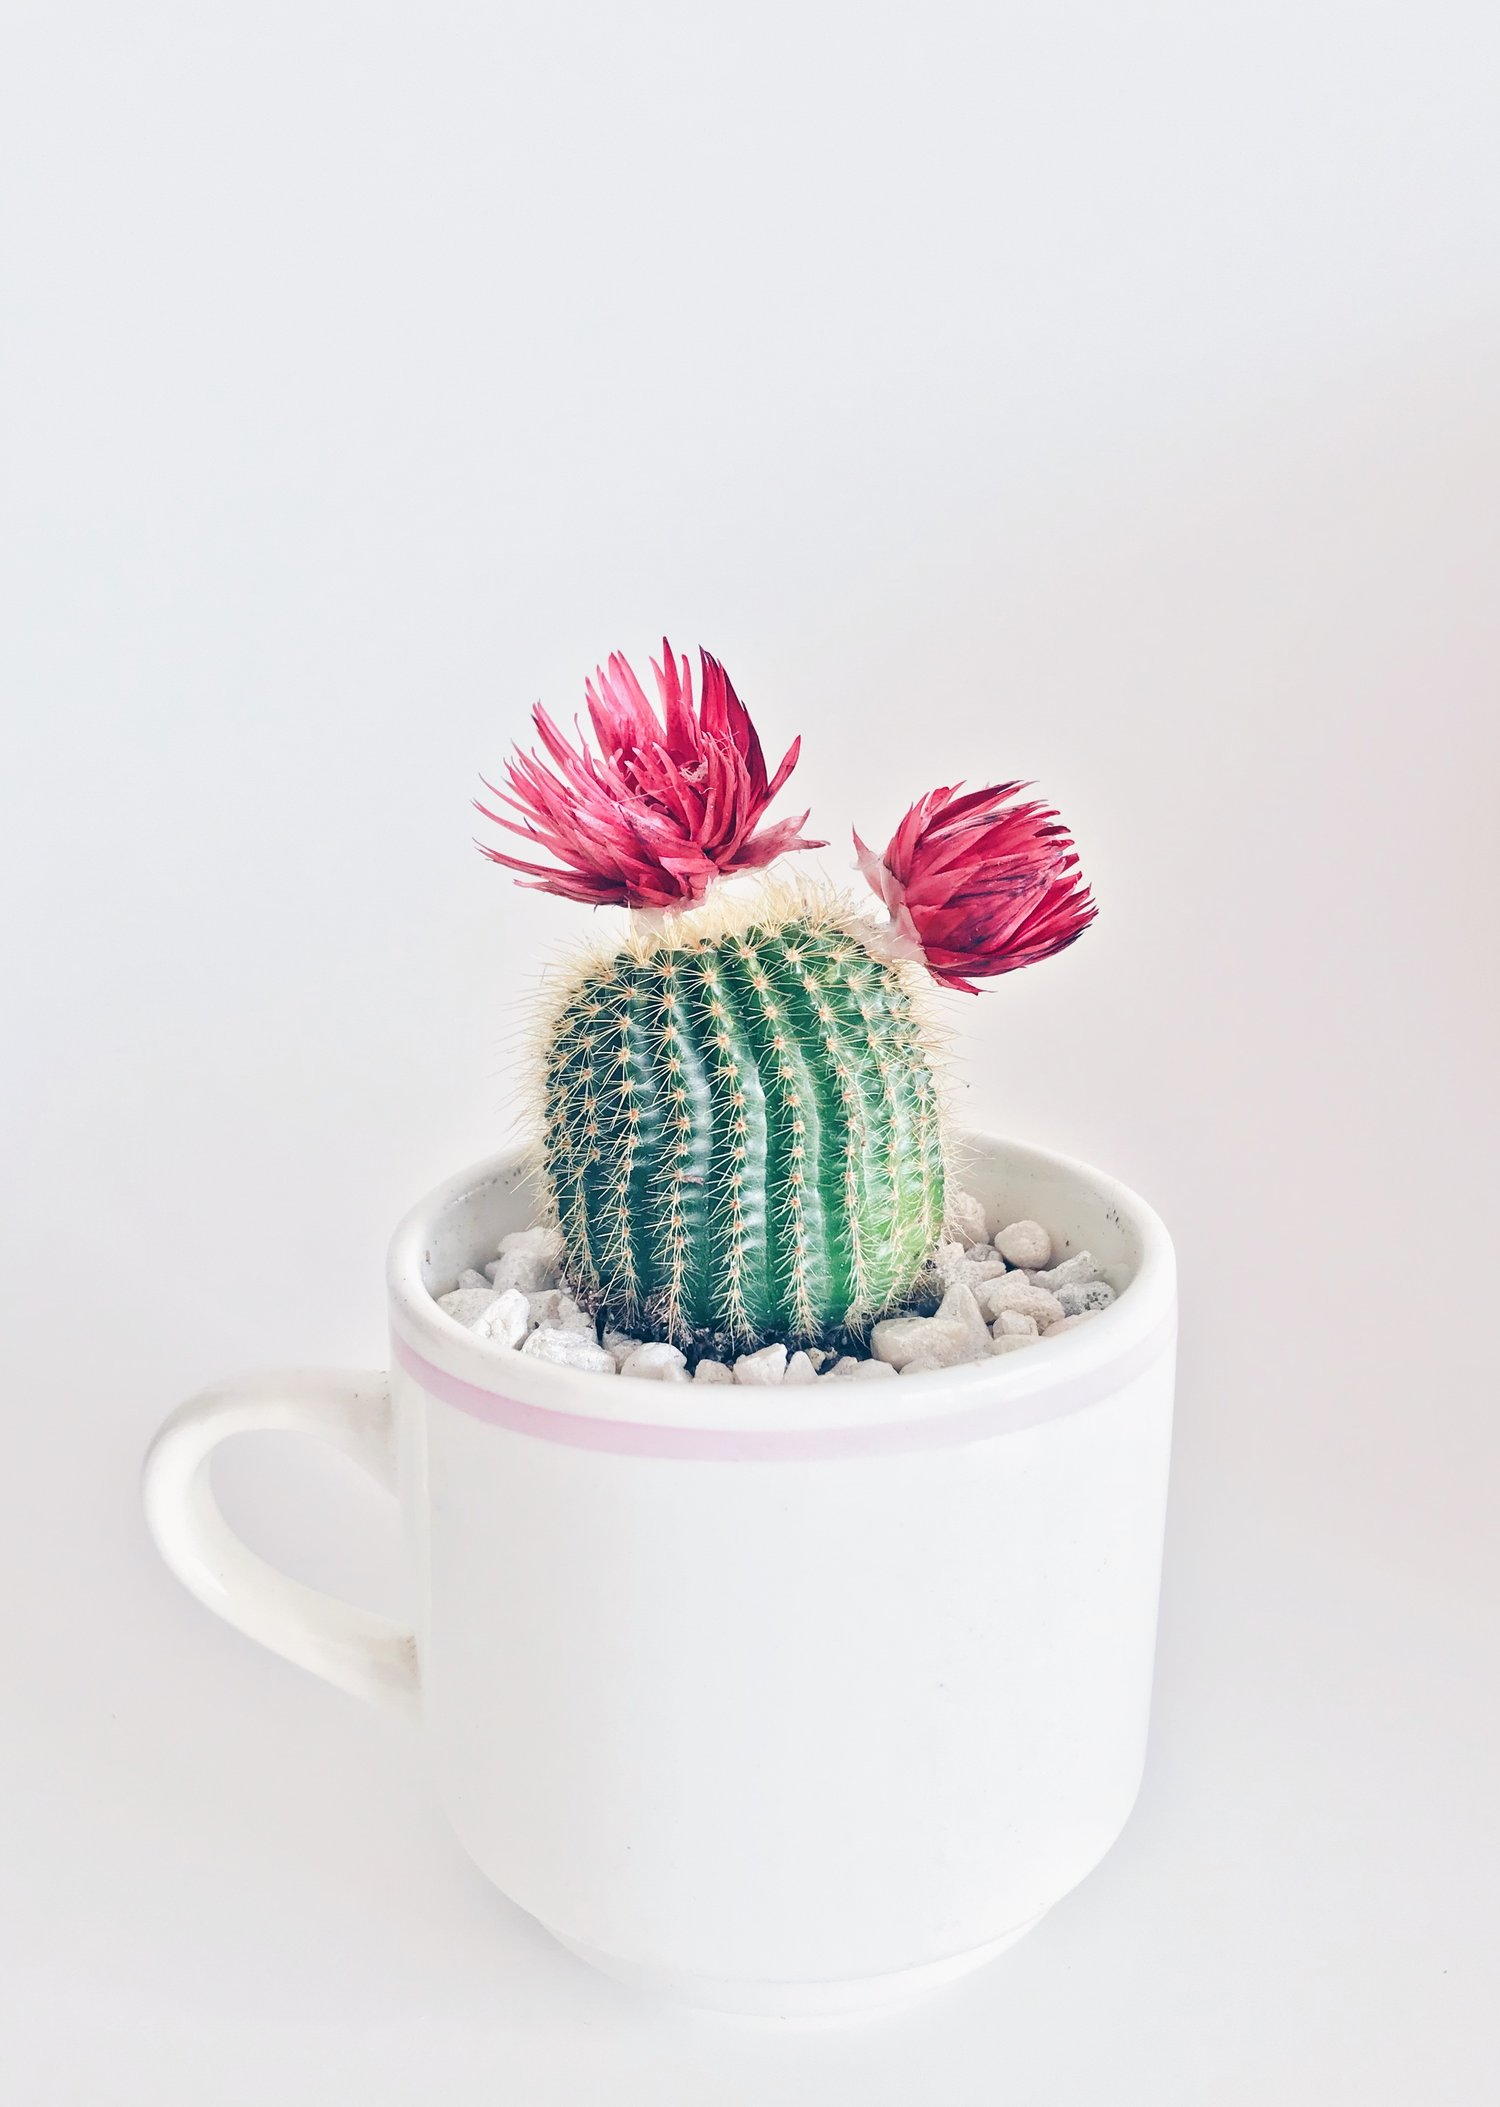 Cactus Flower Comedy Festival Tucson Improv Movement